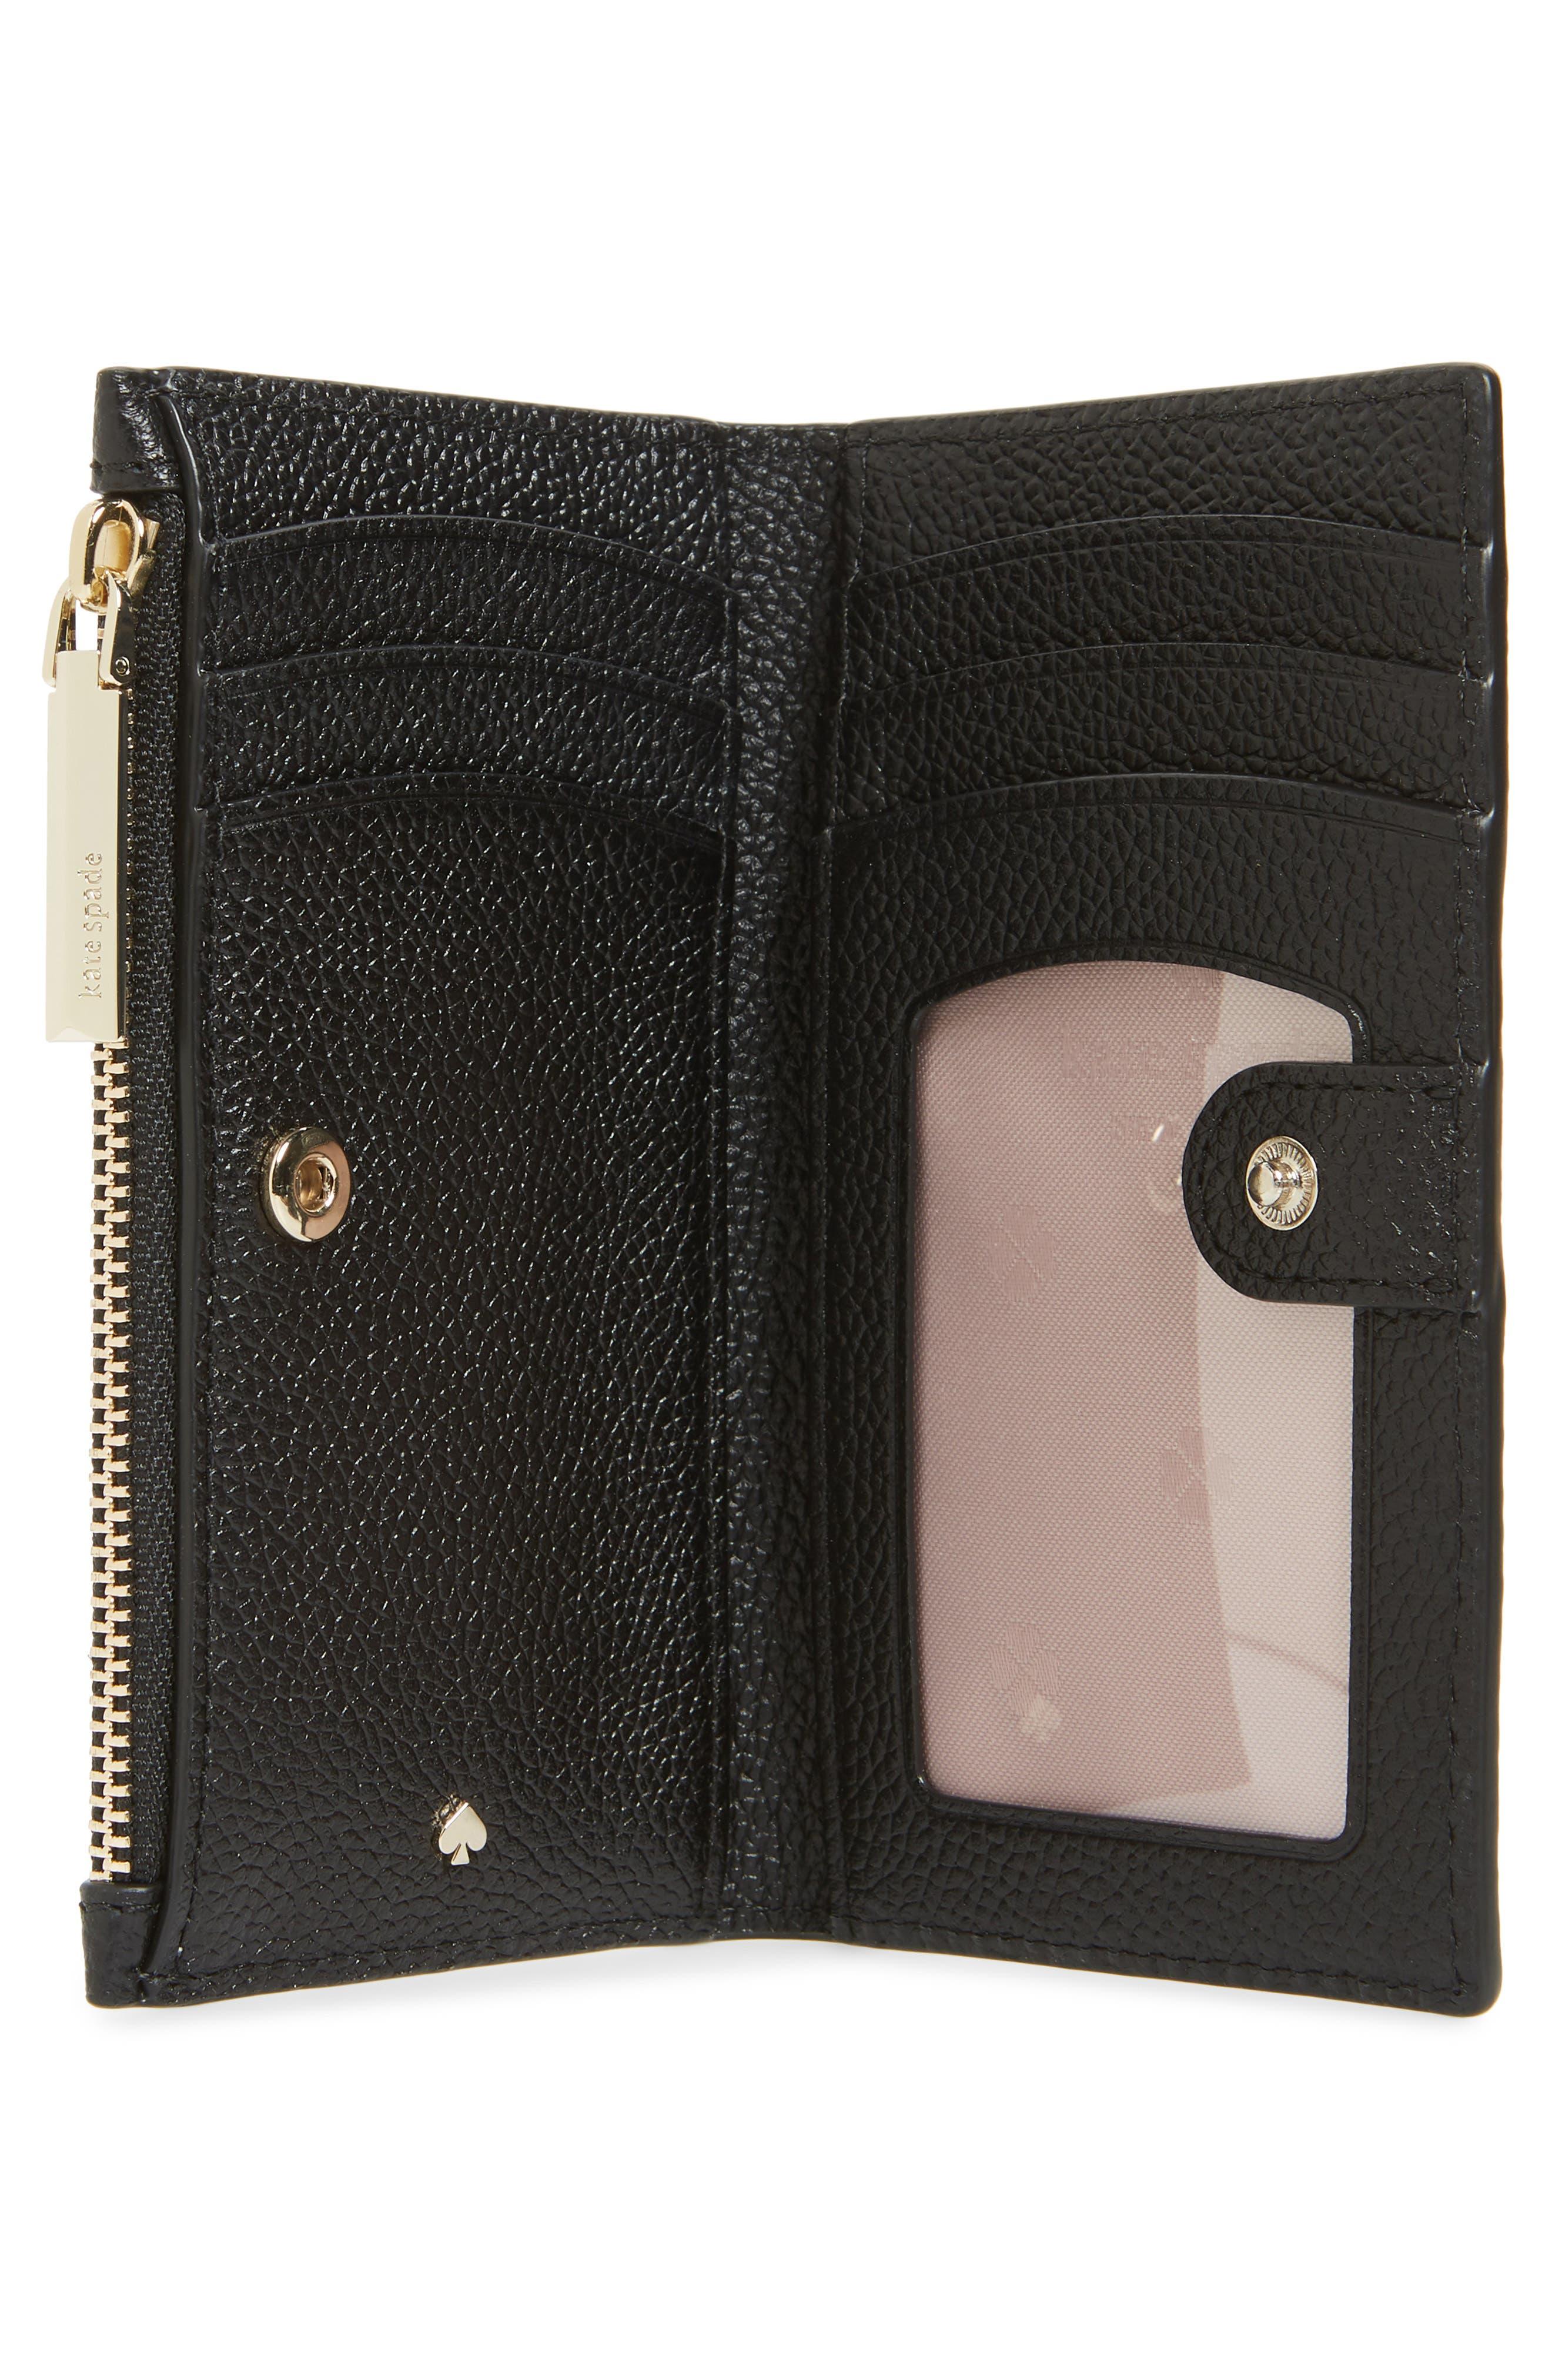 KATE SPADE NEW YORK,                             margaux slim bifold wallet,                             Alternate thumbnail 2, color,                             BLACK